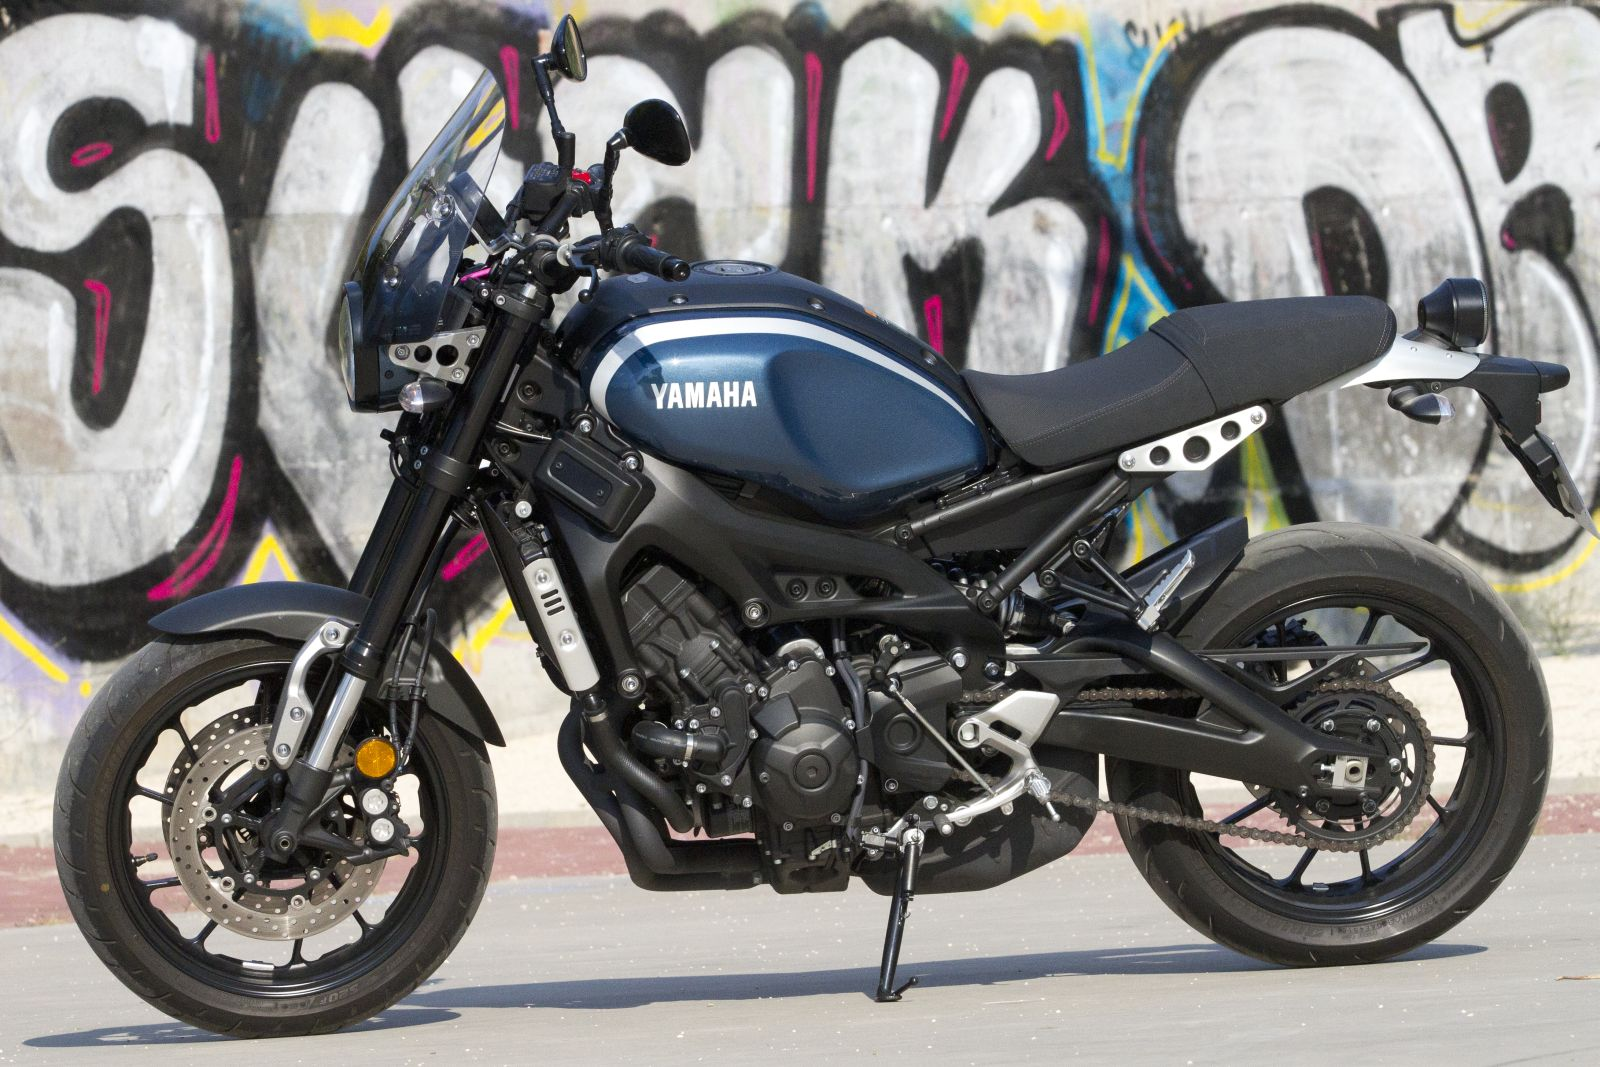 Yamaha XSR-900 al detalle